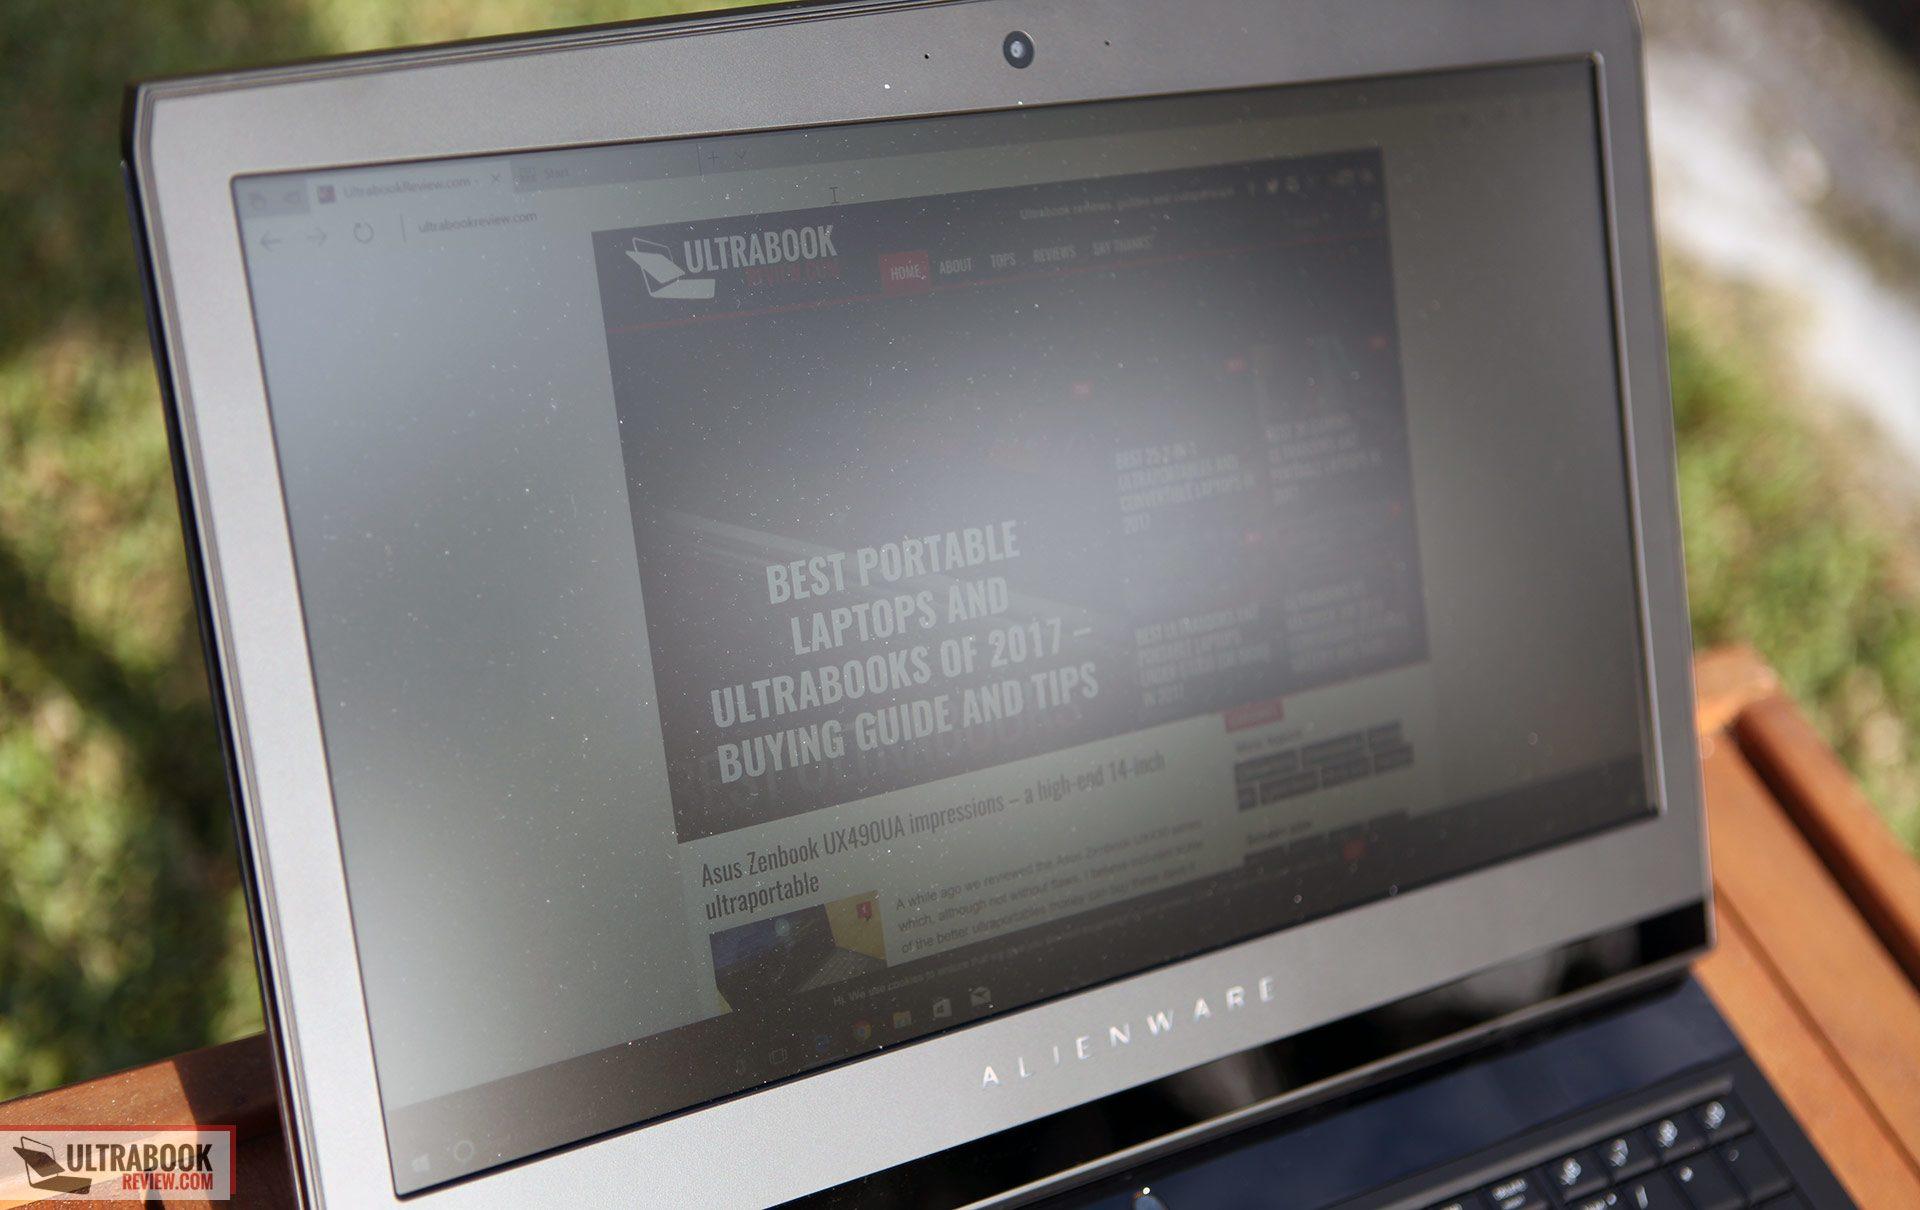 Alienware 17 R4 review - Core i7-7820HK CPU, Nvidia GTX 1080